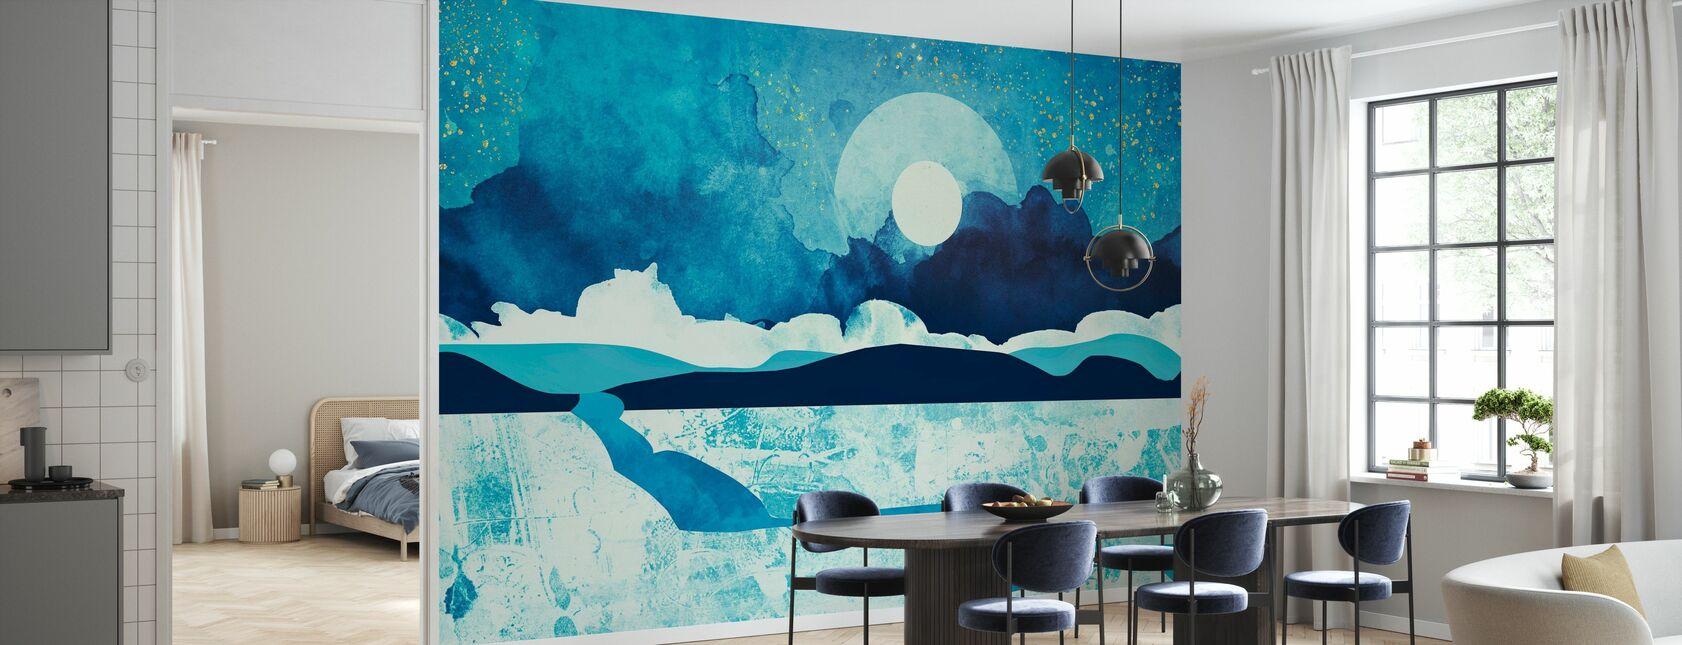 Bleu Désert - SpaceFrogDesigns - Papier peint - Cuisine